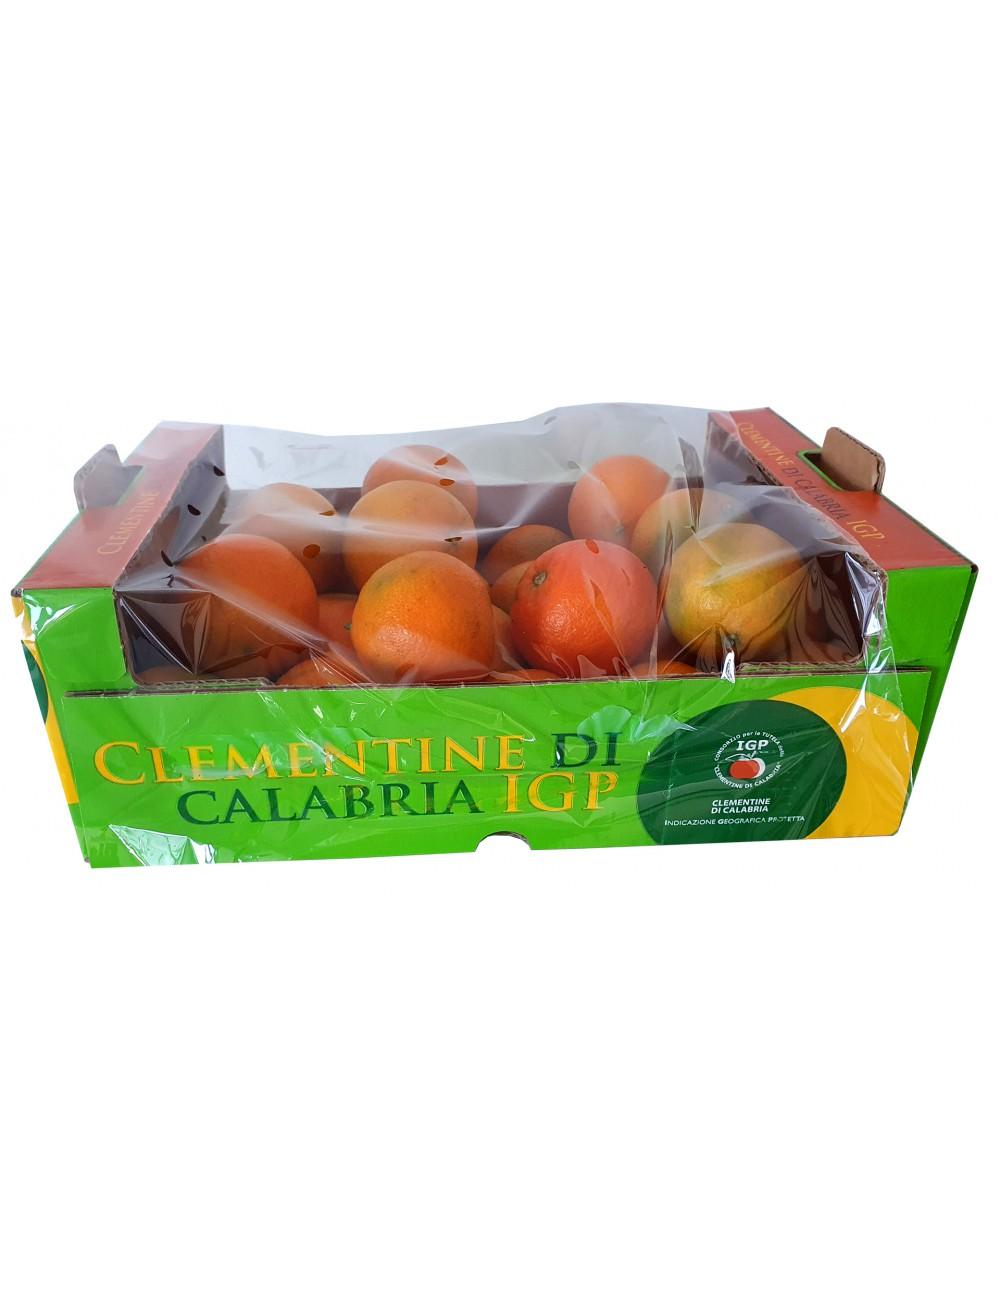 Clementine IGP Calabria BIO...